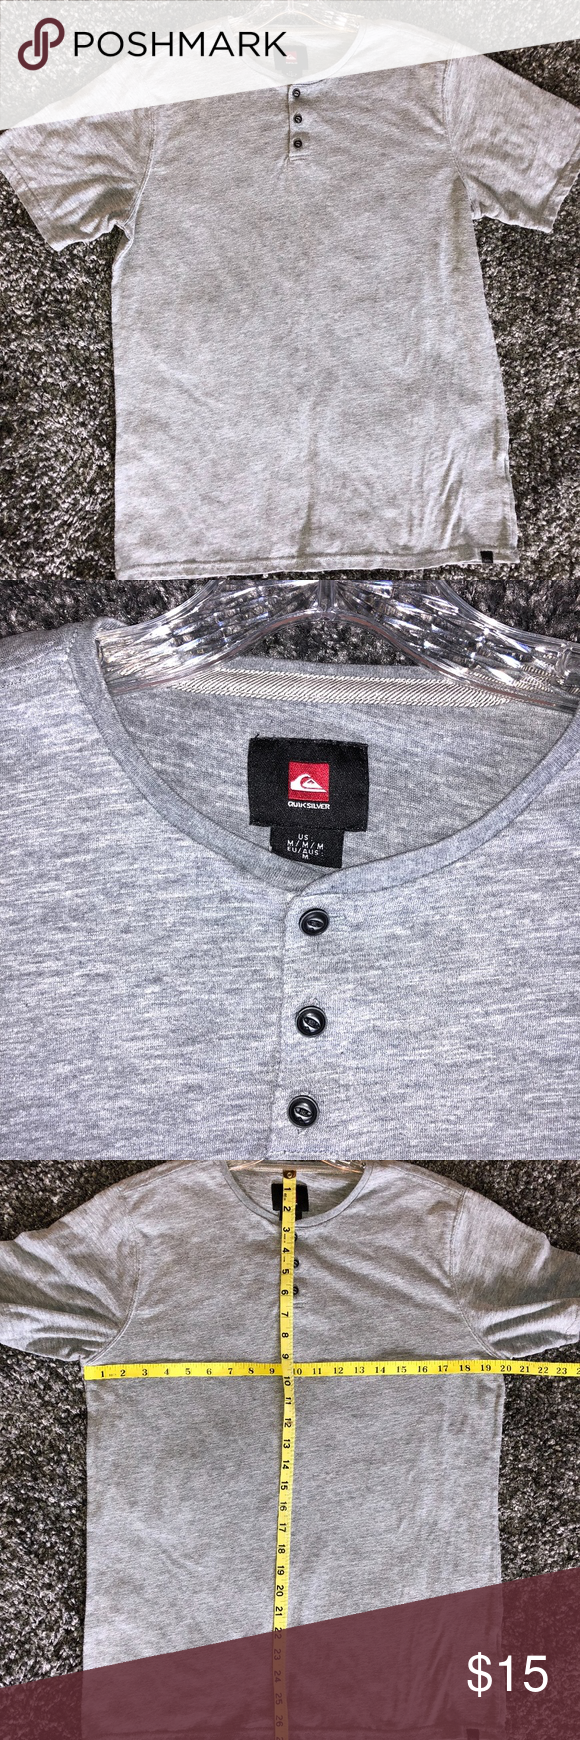 Quicksilver Men's Grey Short Sleeve 3 Button Tee Great men's